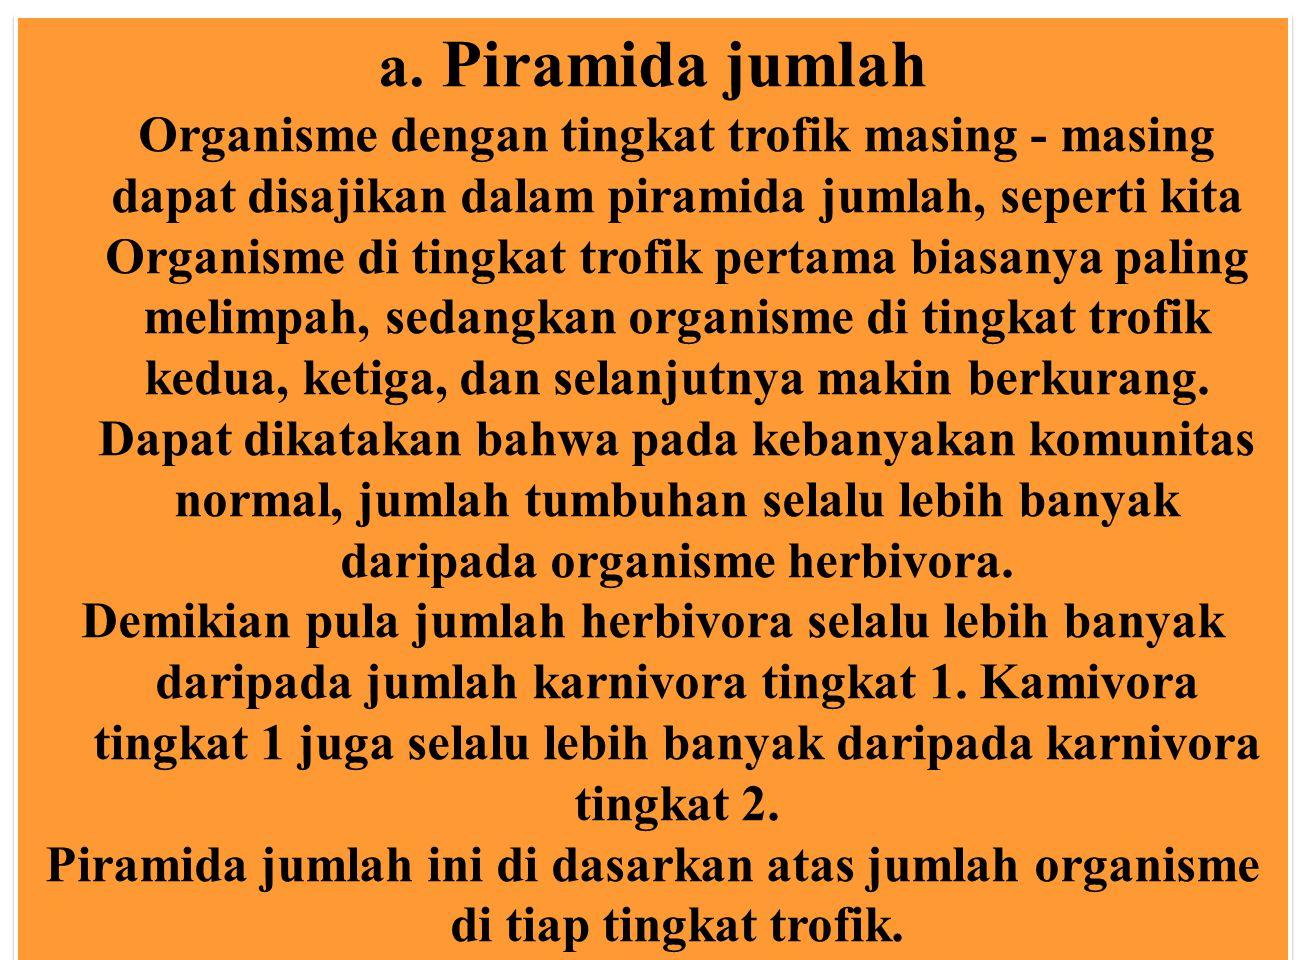 a. Piramida jumlah Organisme dengan tingkat trofik masing - masing dapat disajikan dalam piramida jumlah, seperti kita Organisme di tingkat trofik per